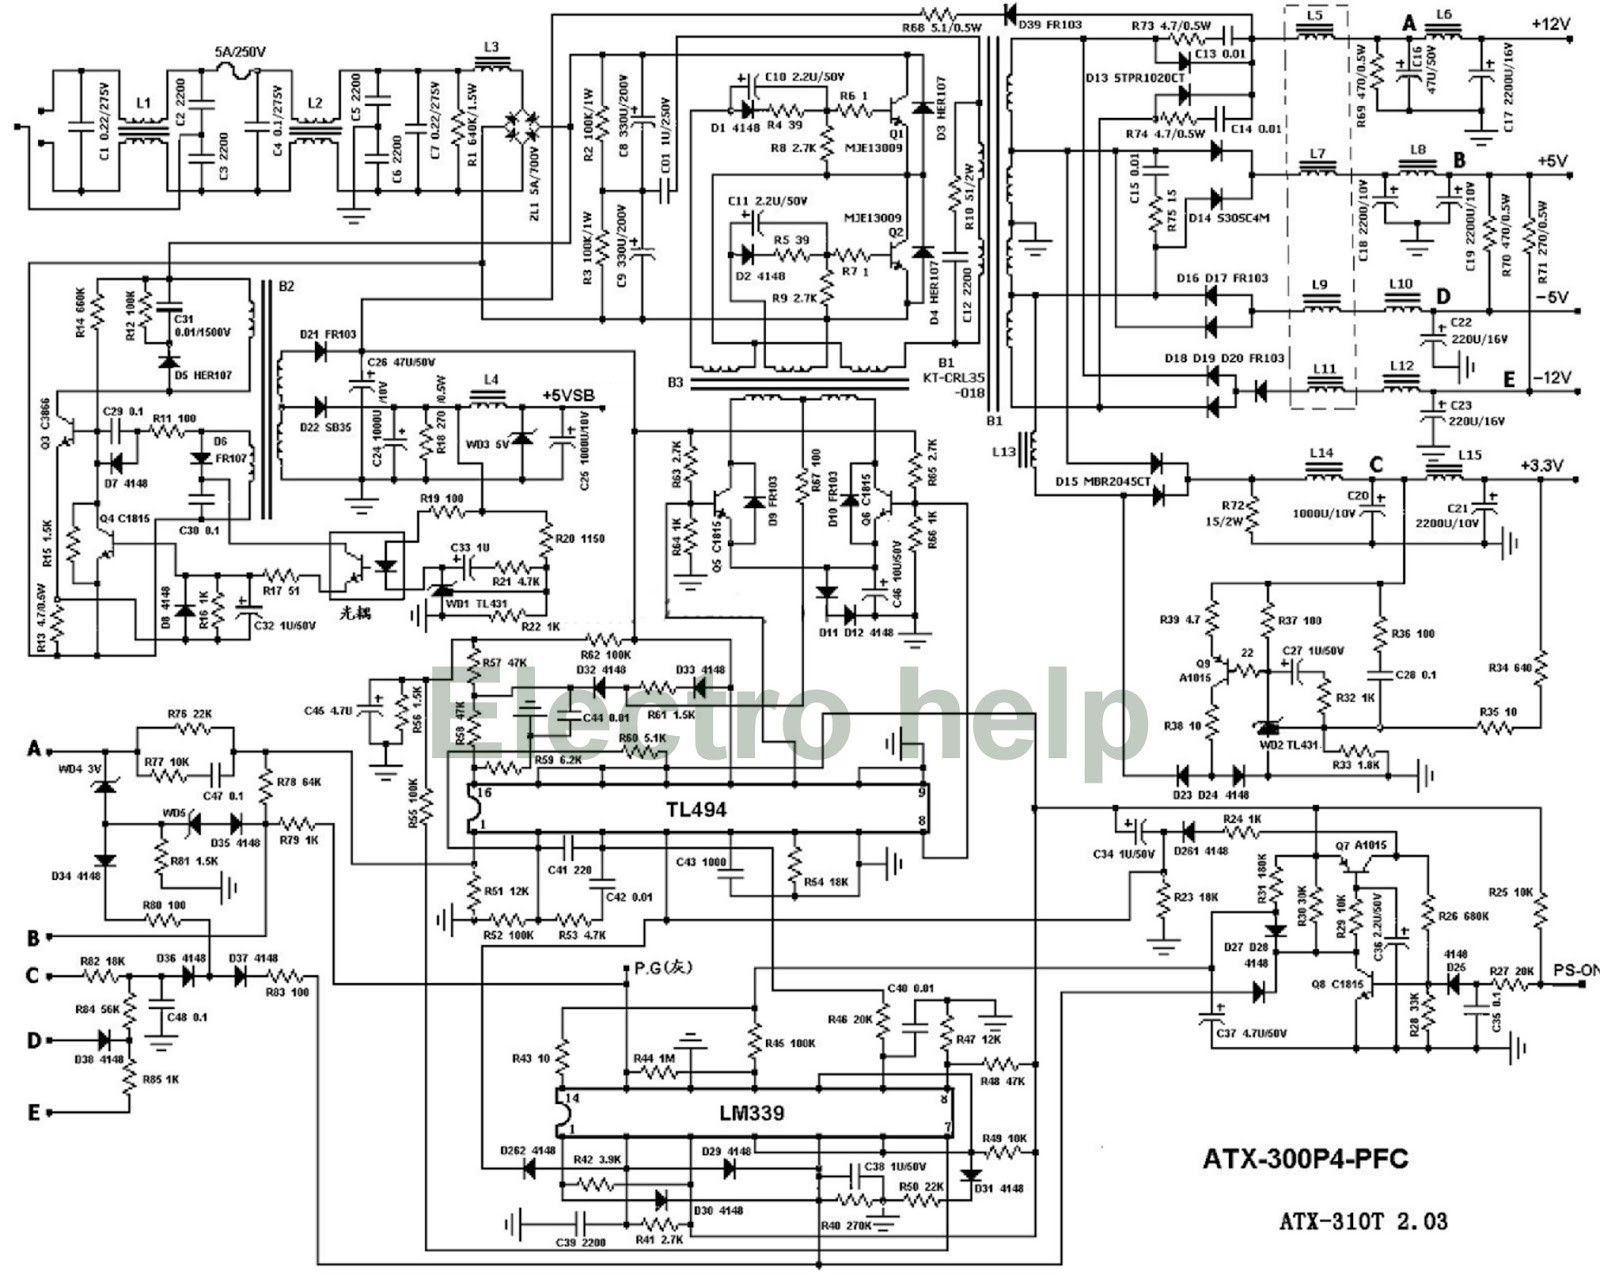 Bestec Atx 250 12z Schematic Wire Data Schema Mini 24 Pin Wiring Diagram Inspirational Image Rh Mainetreasurechest Com